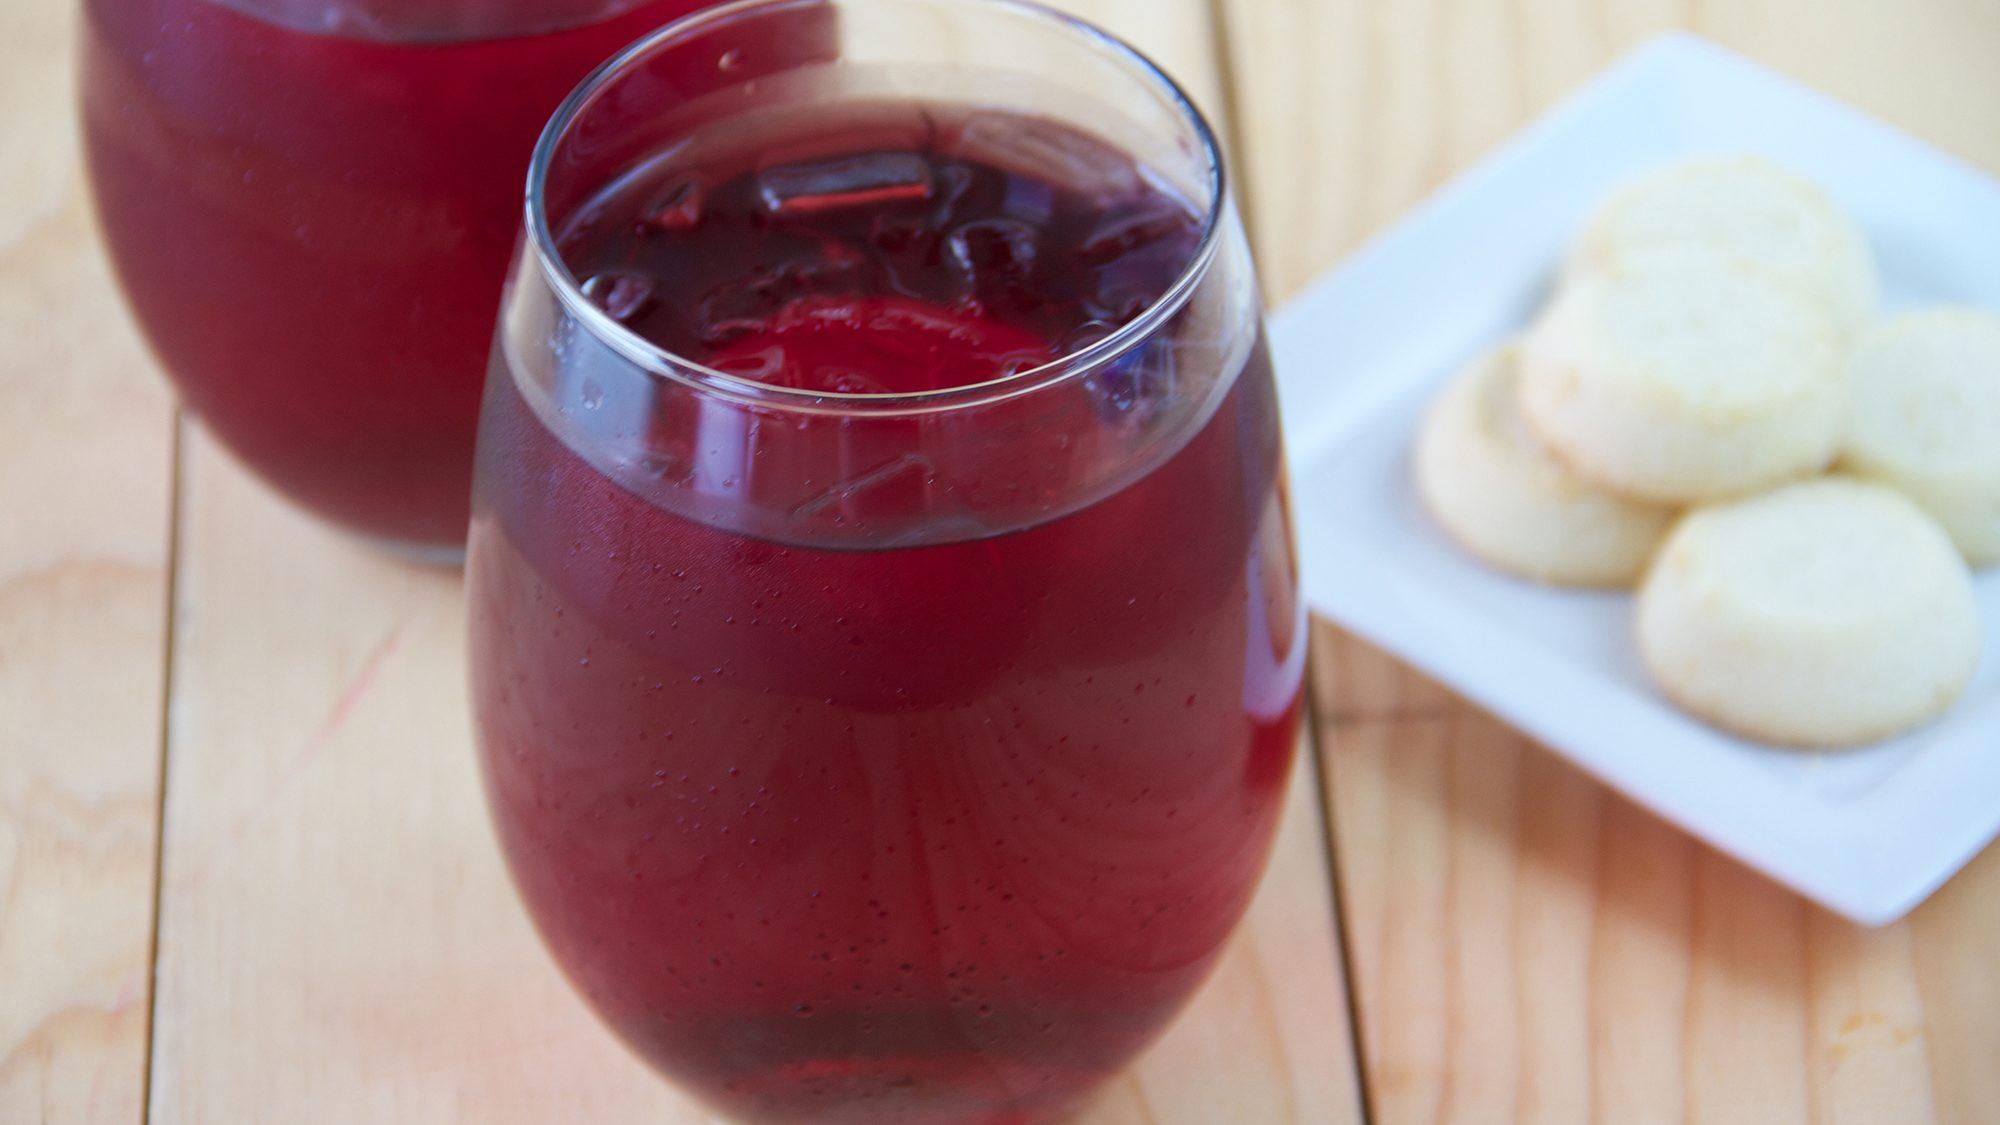 McCormick Gourmet Hibiscus Clove Iced Tea